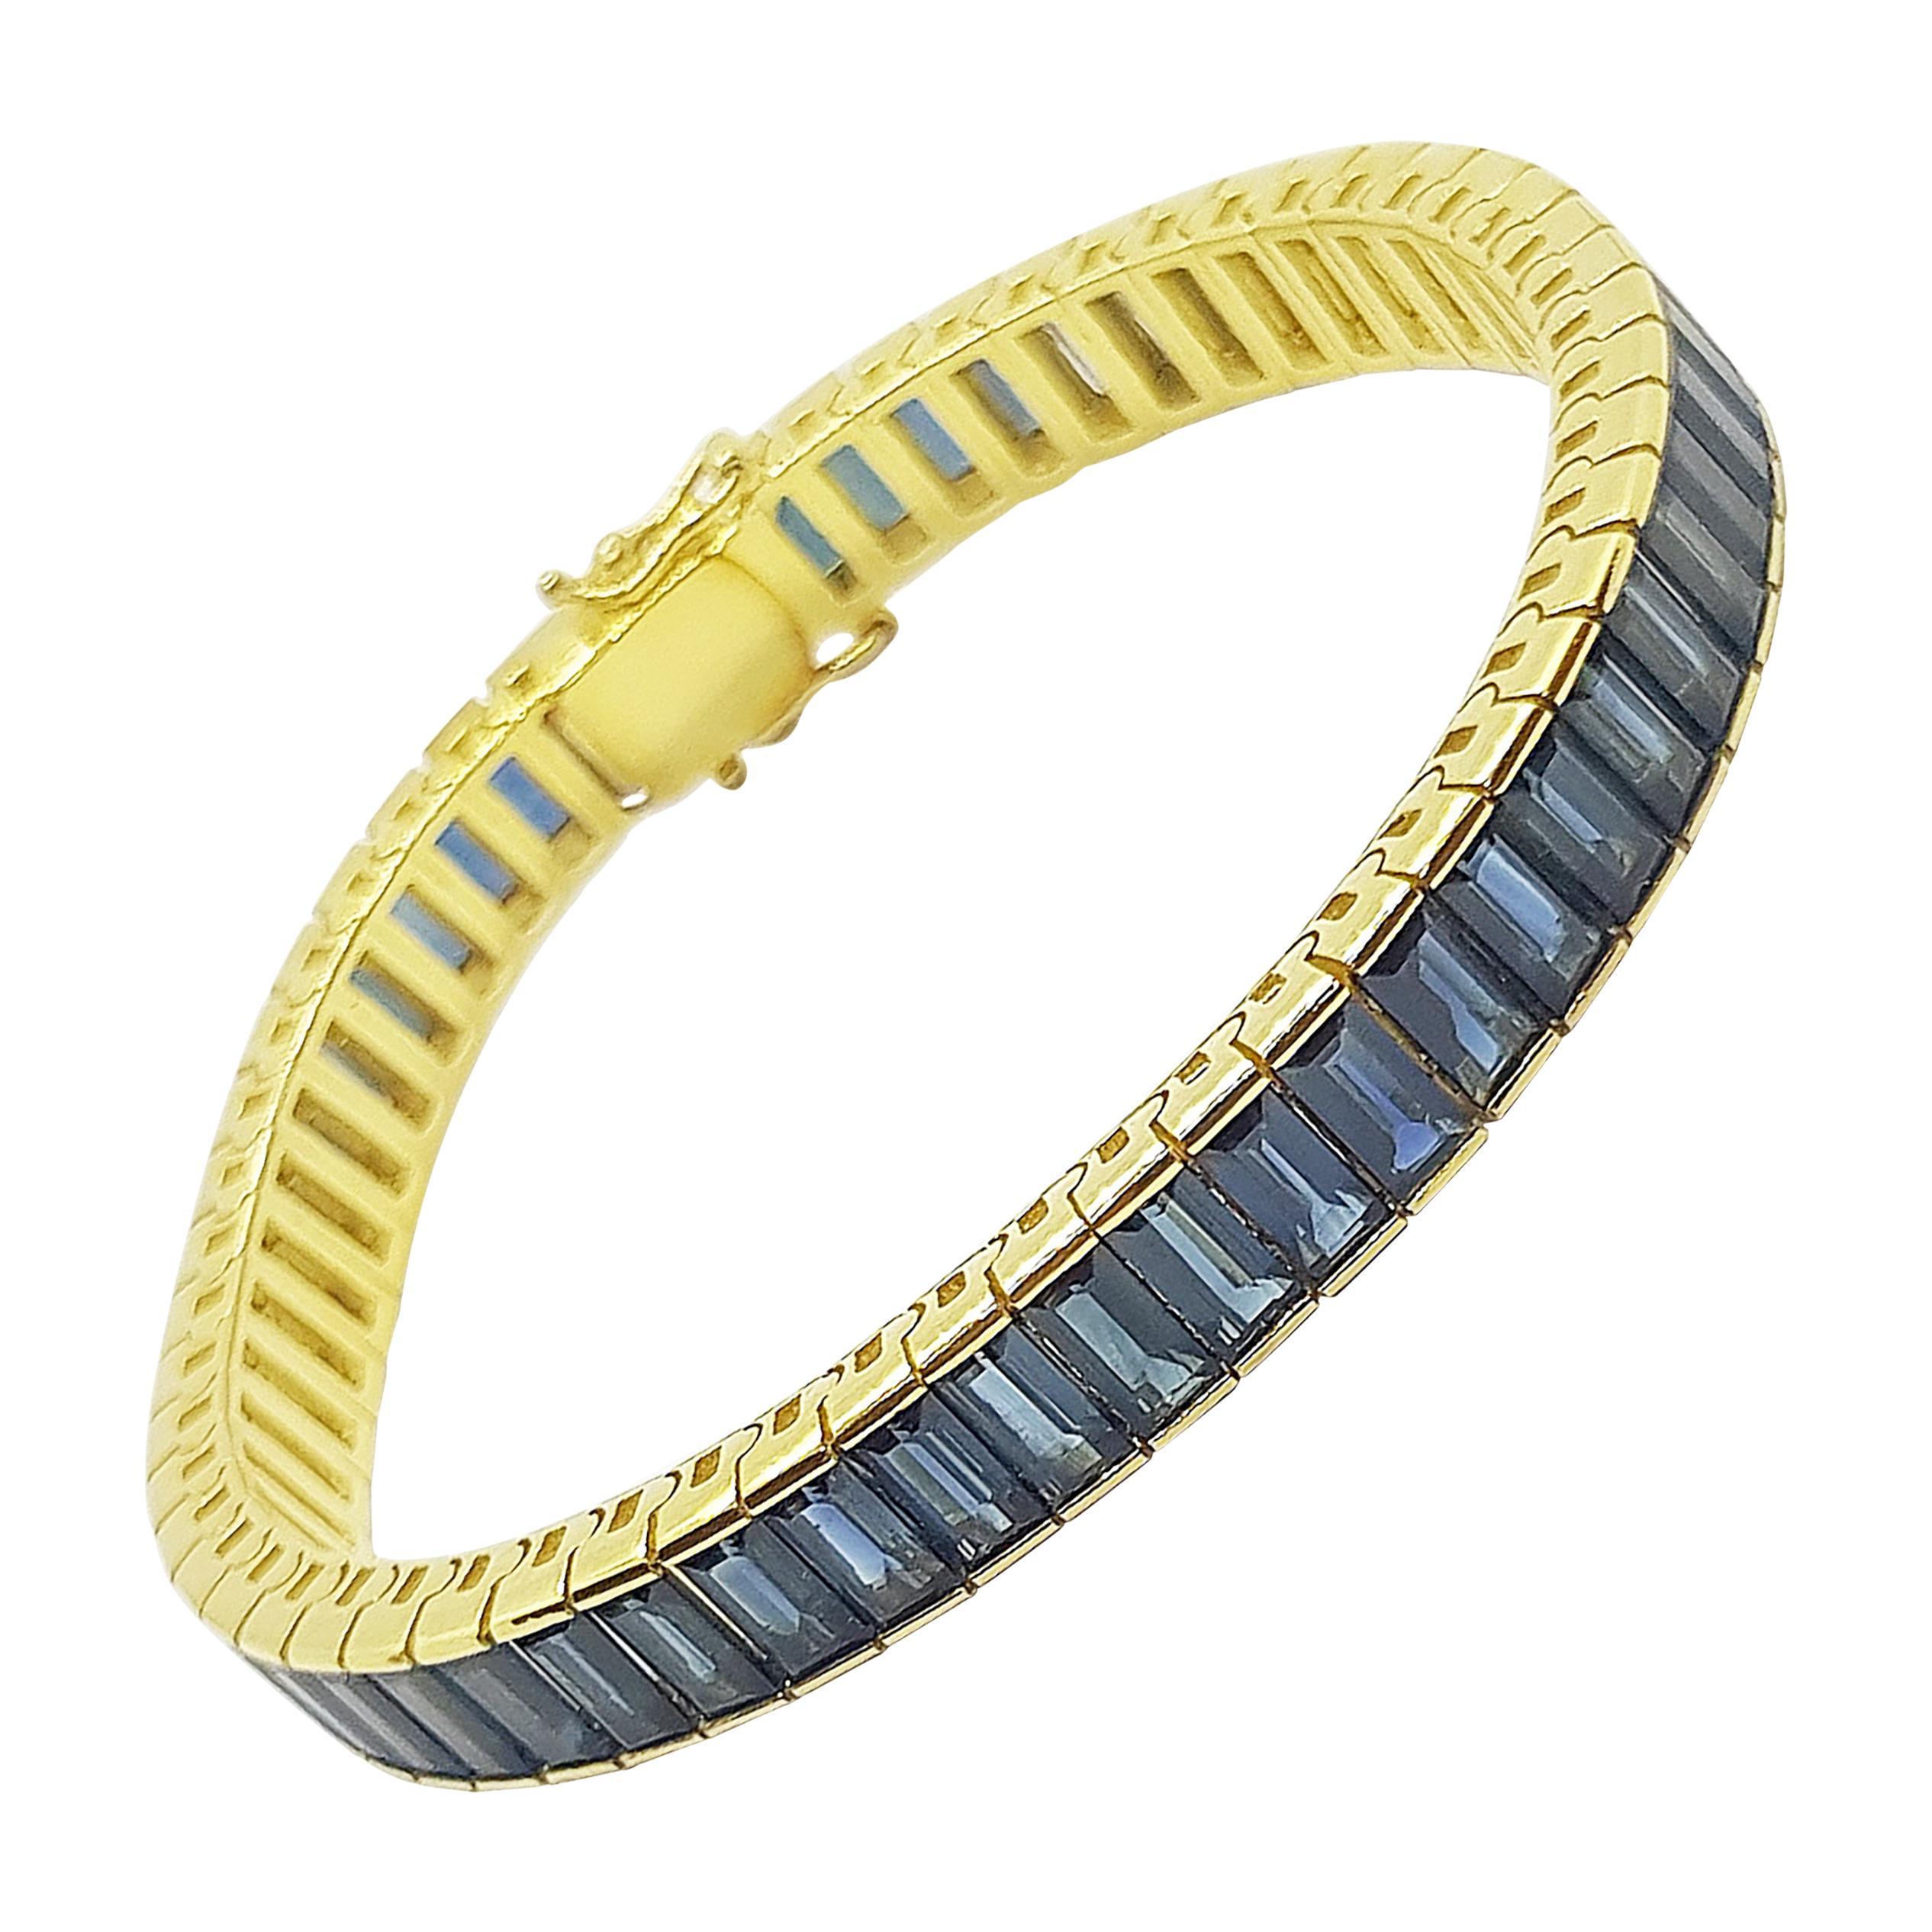 Baguette Cut Blue Sapphire Bracelet Set in 18 Karat Gold Settings